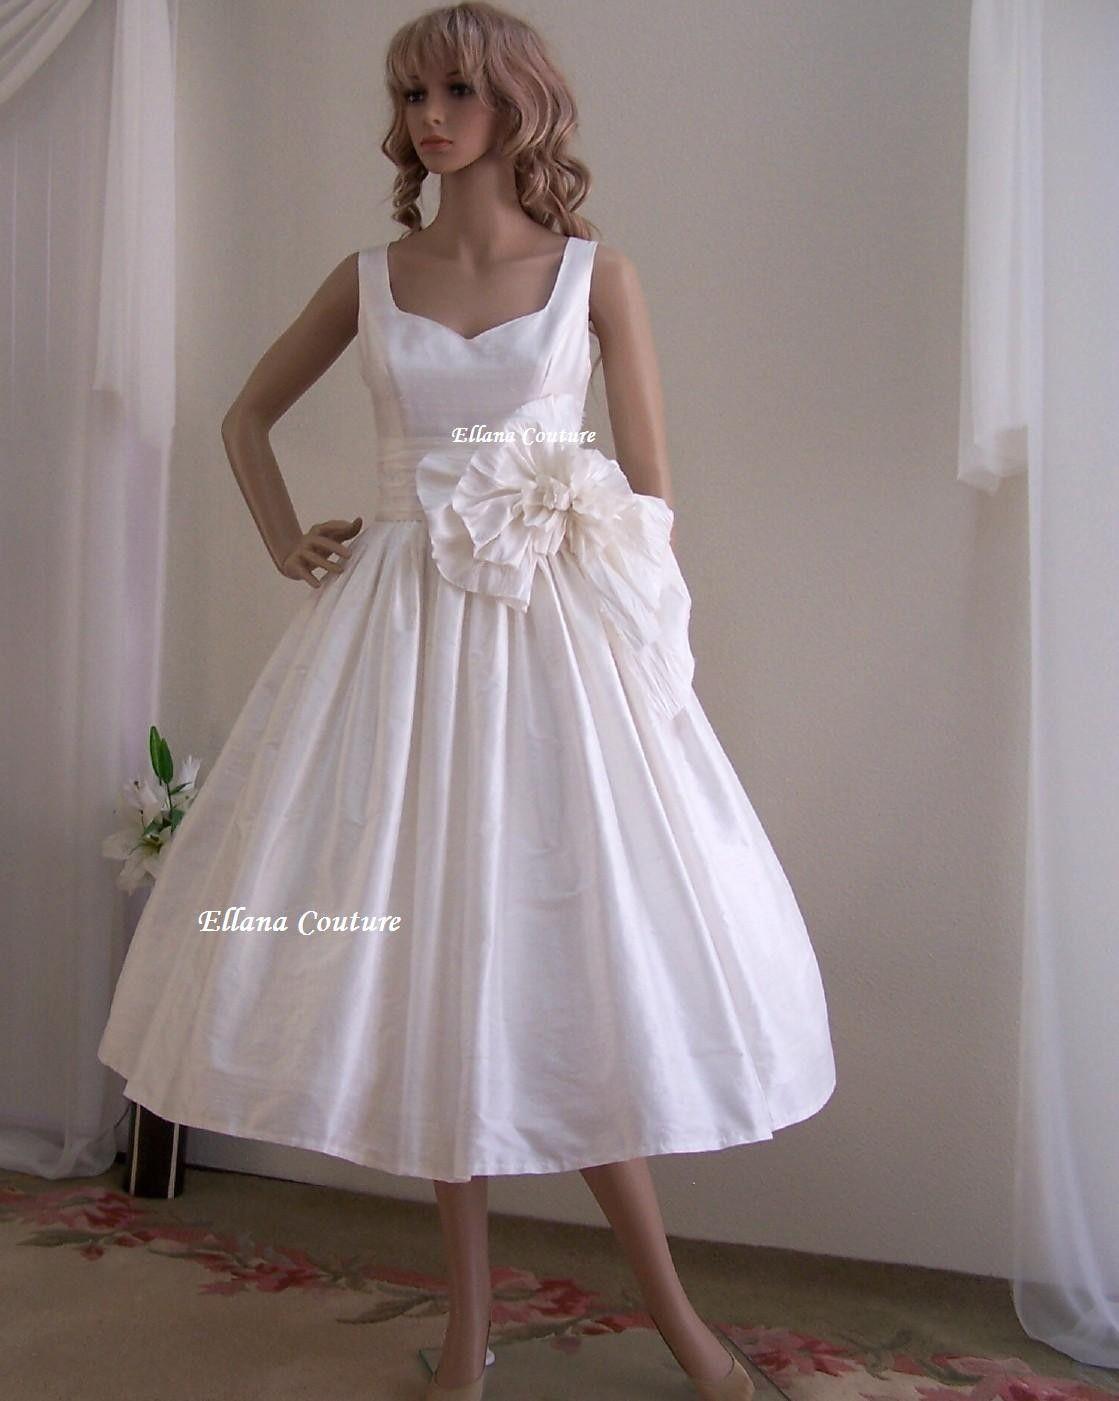 Wedding Vintage Inspired Dresses vintage inspired dresses photo album fashion trends and models 1000 images about amandas wedding on pinterest vintage